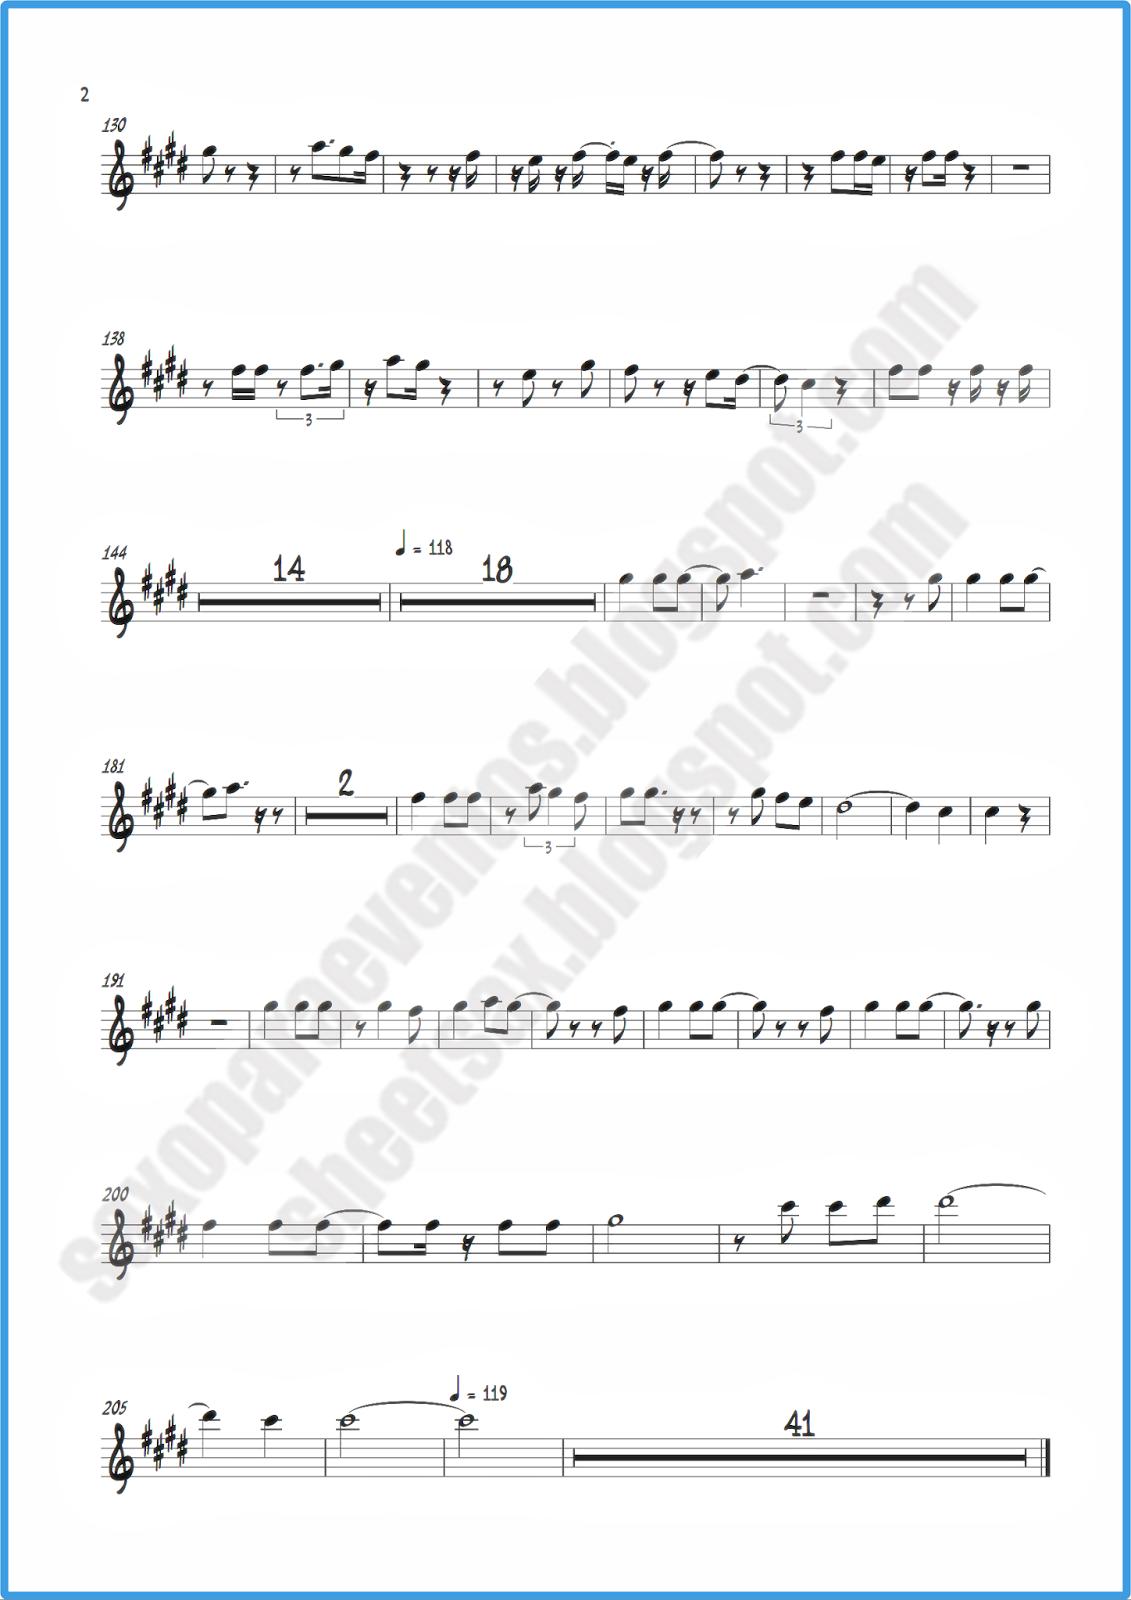 Alto sax sheet music butik work